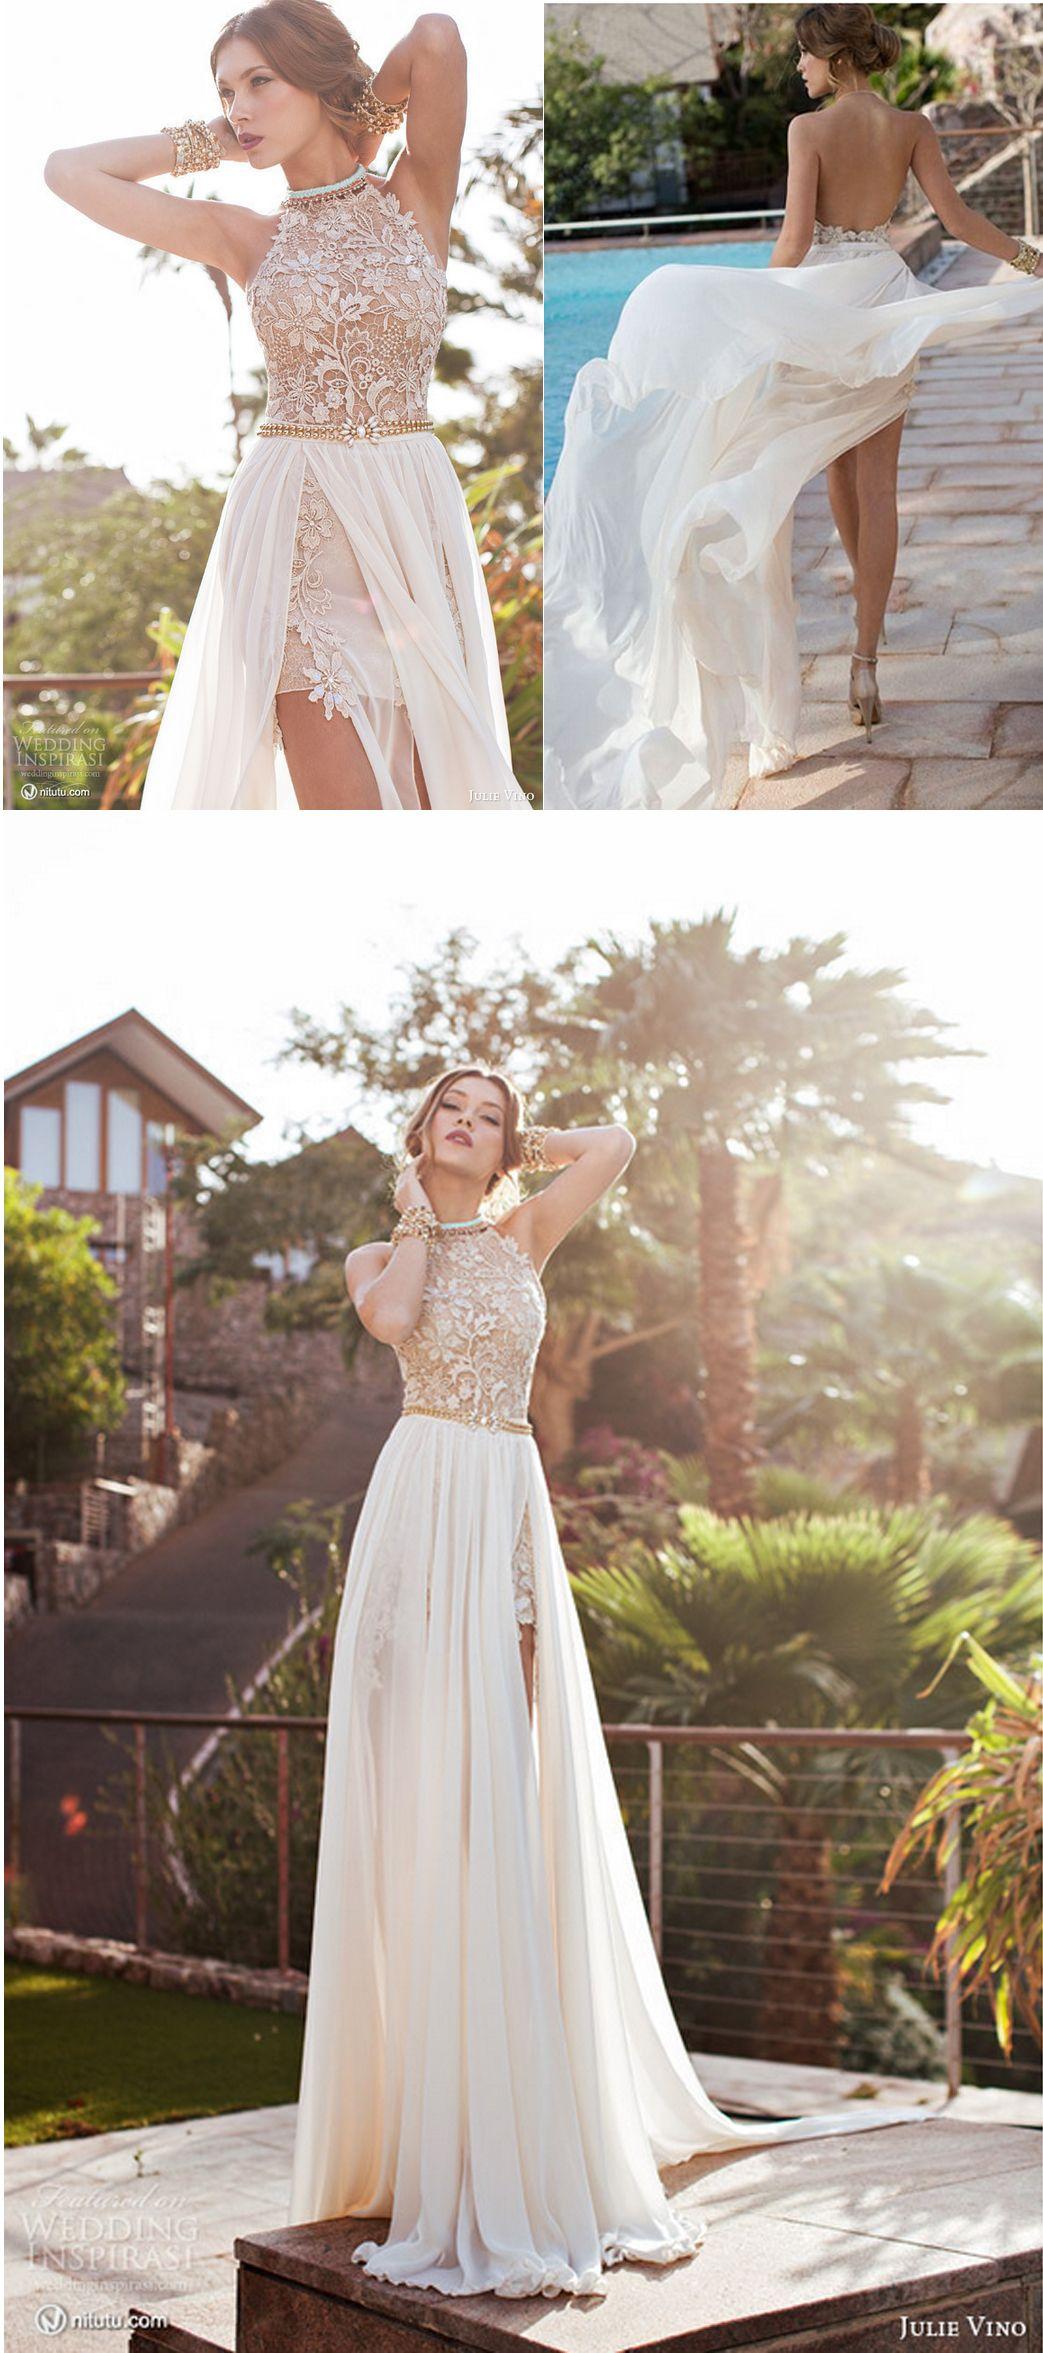 Maravilhoso vestido casamento pinterest prom wedding and